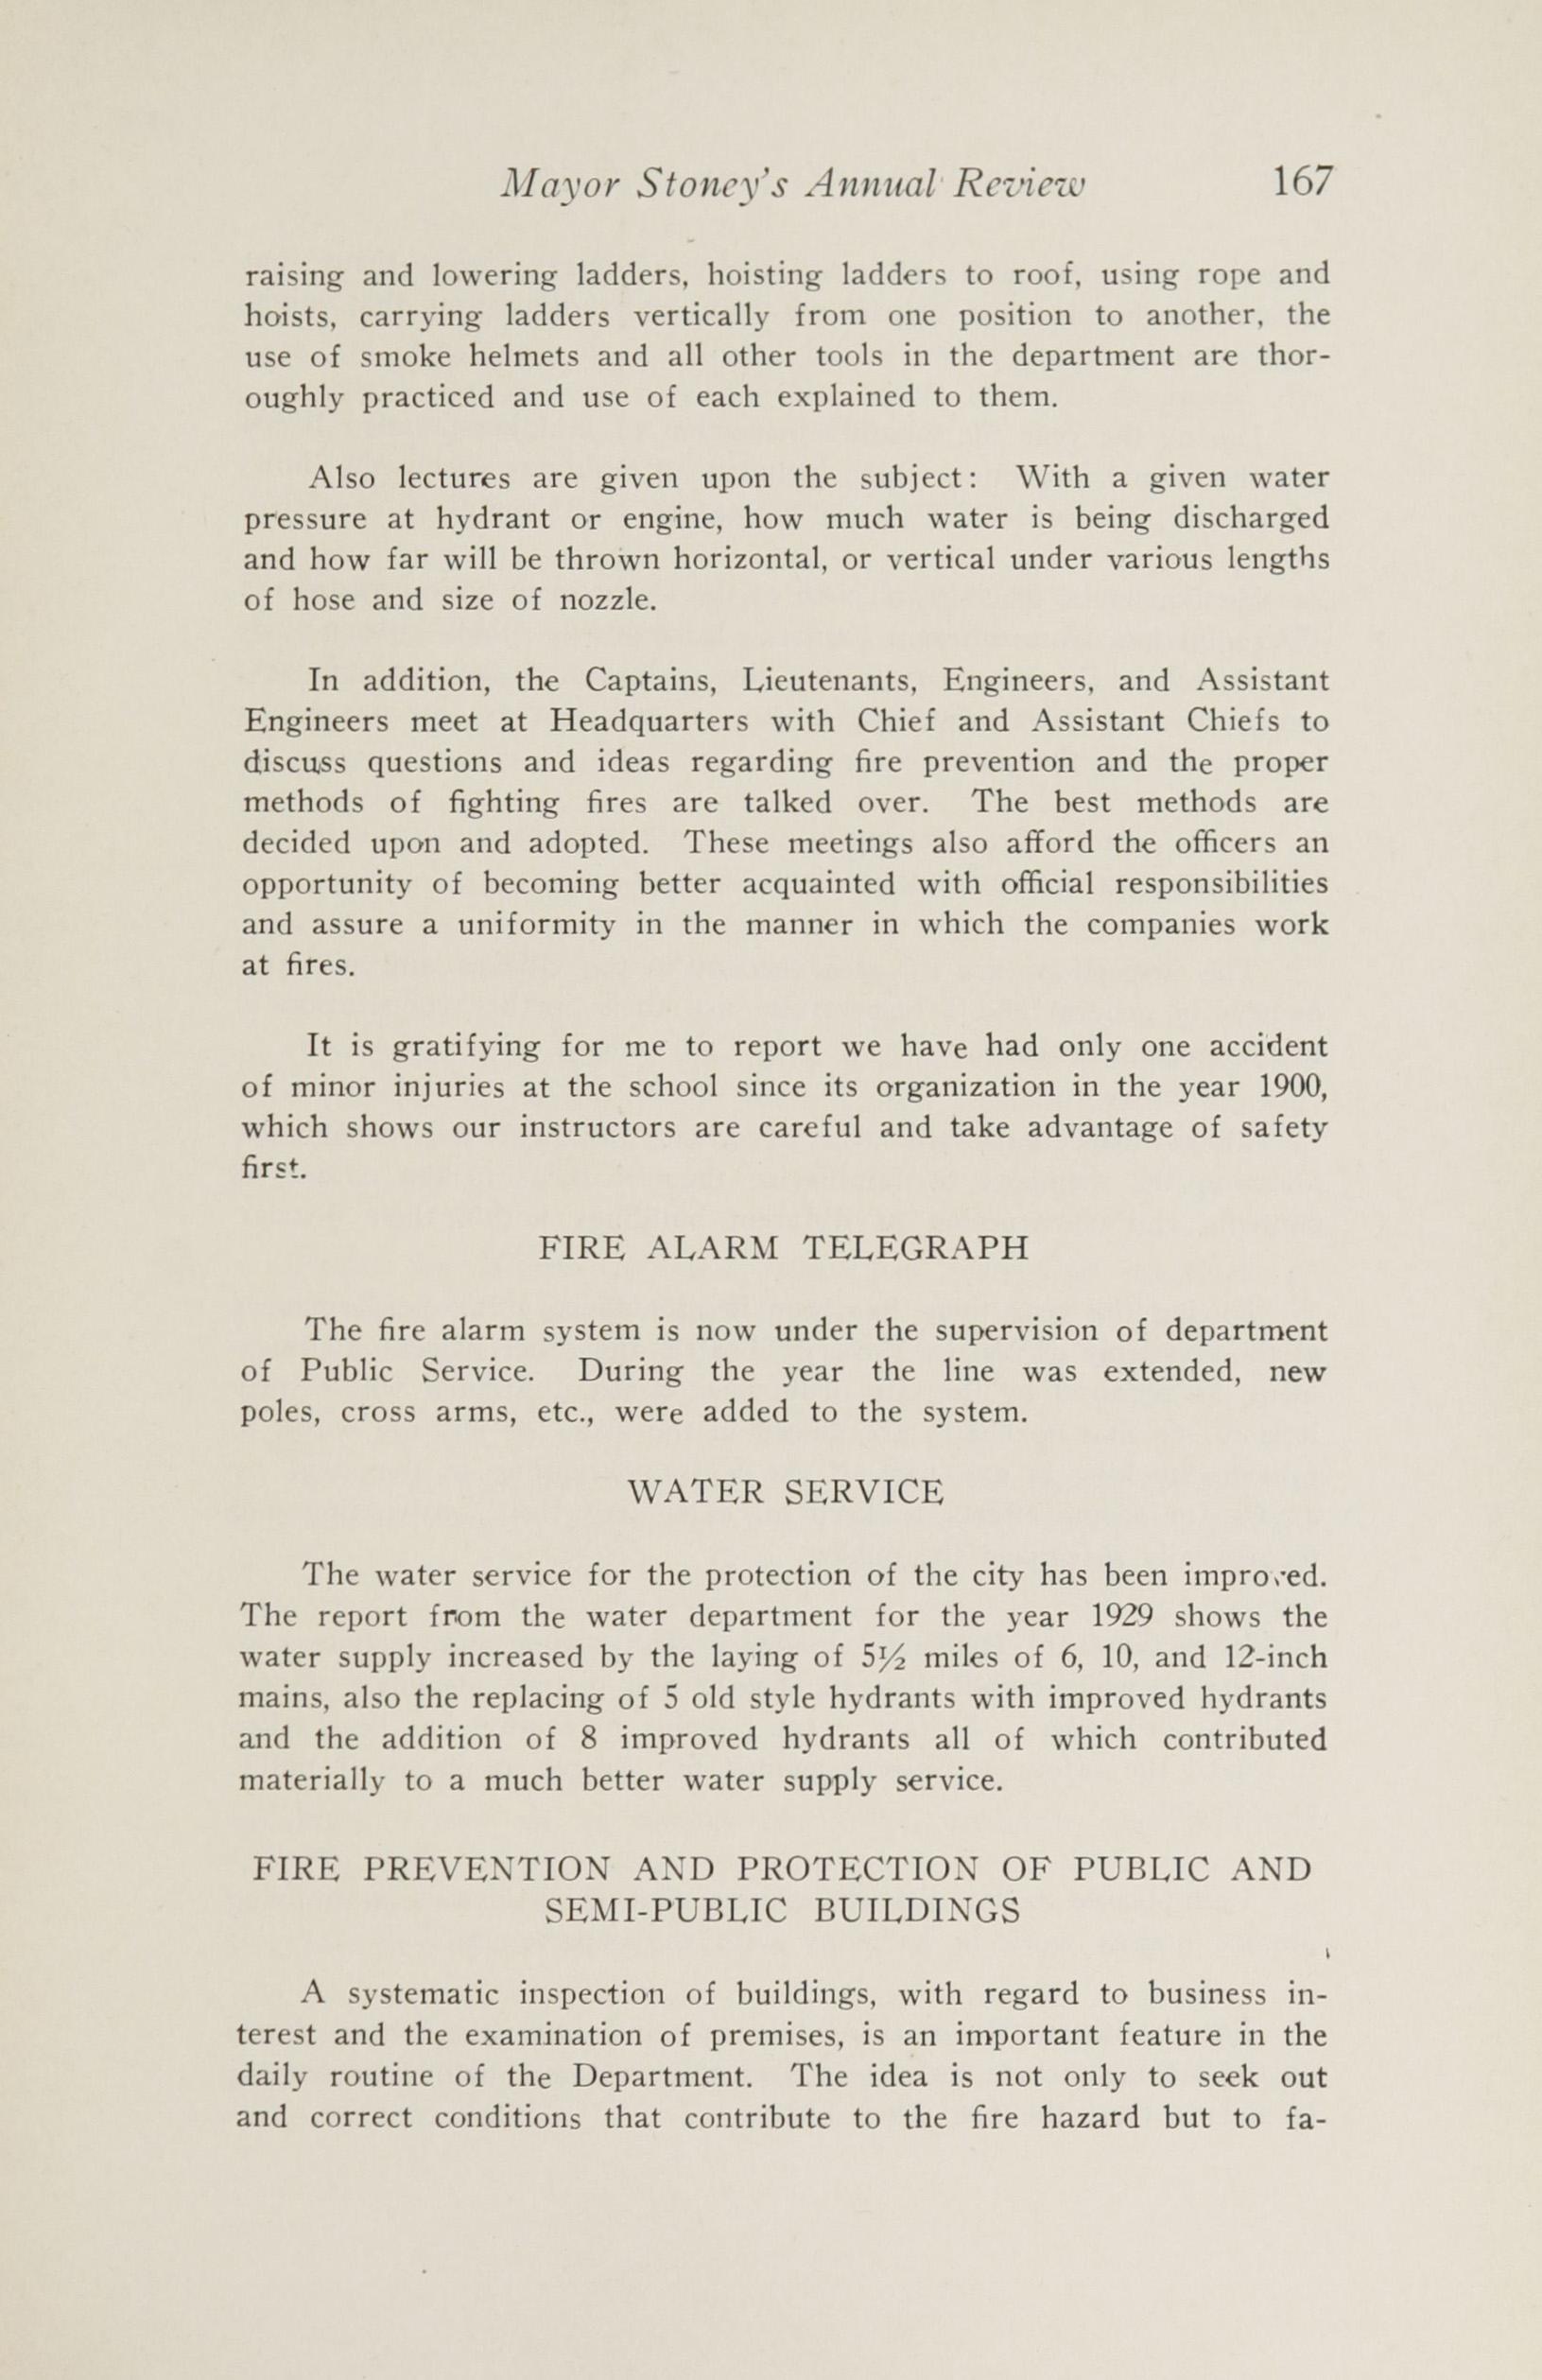 Charleston Yearbook, 1929, page 167